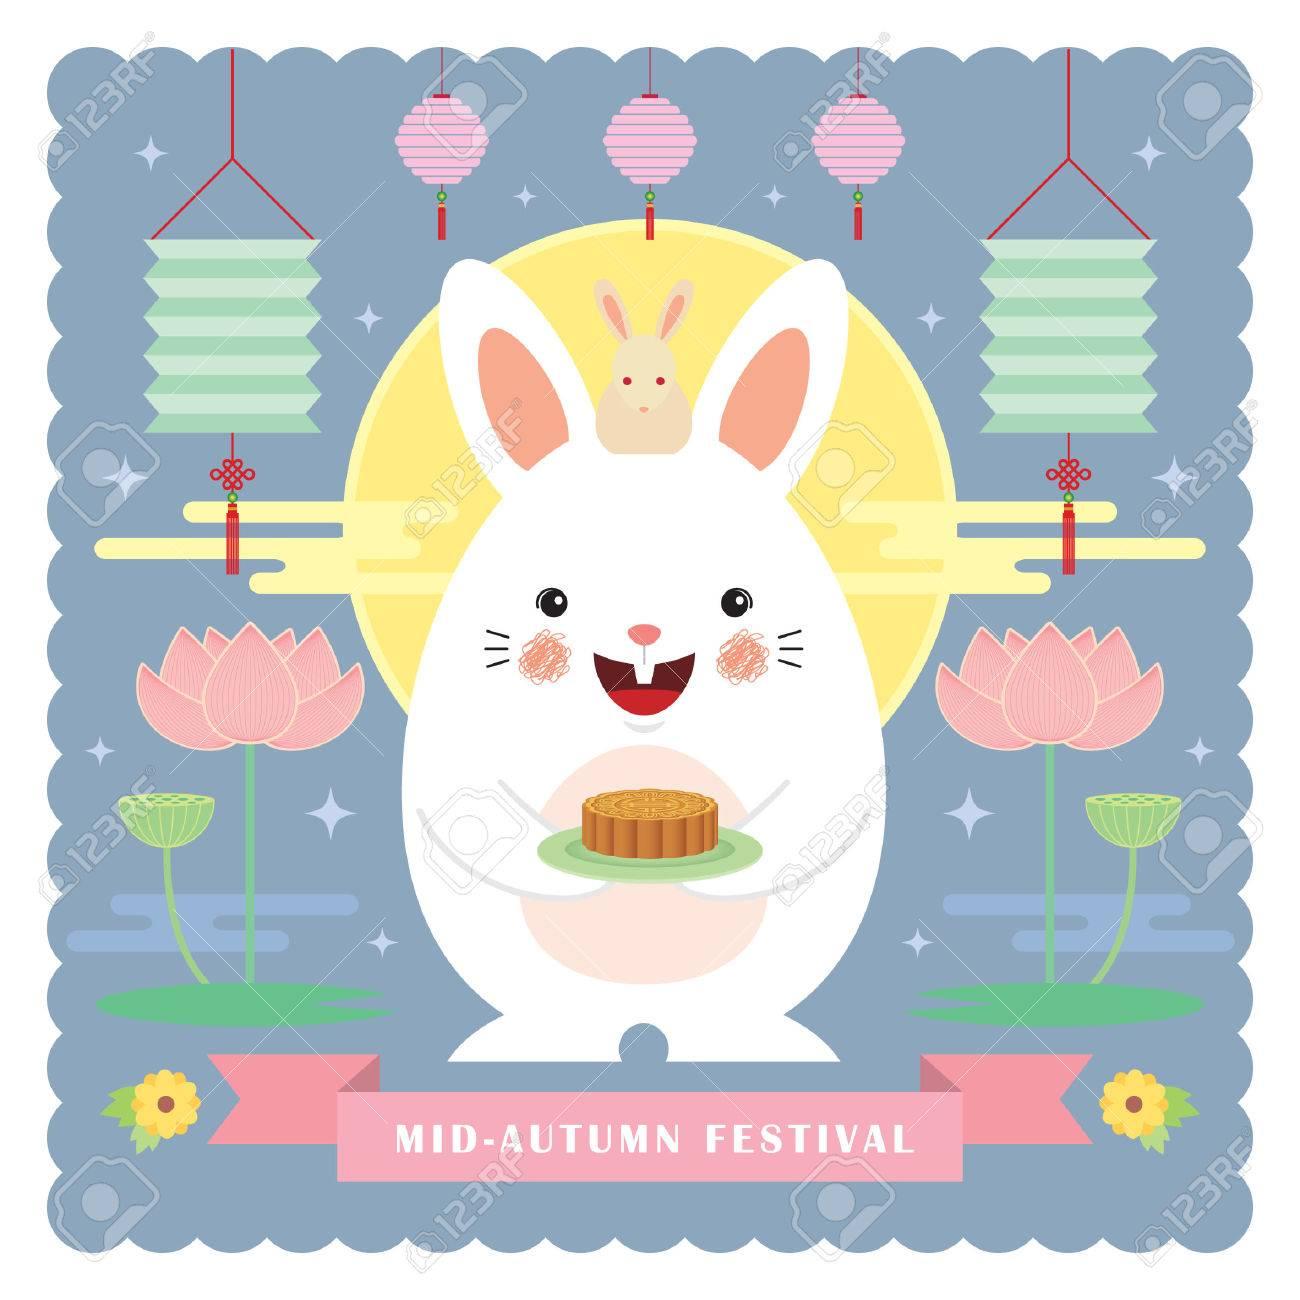 Mid autumn festival greeting card tempalte cute cartoon rabbit mid autumn festival greeting card tempalte cute cartoon rabbit holding mooncake with lanterns lotus kristyandbryce Choice Image